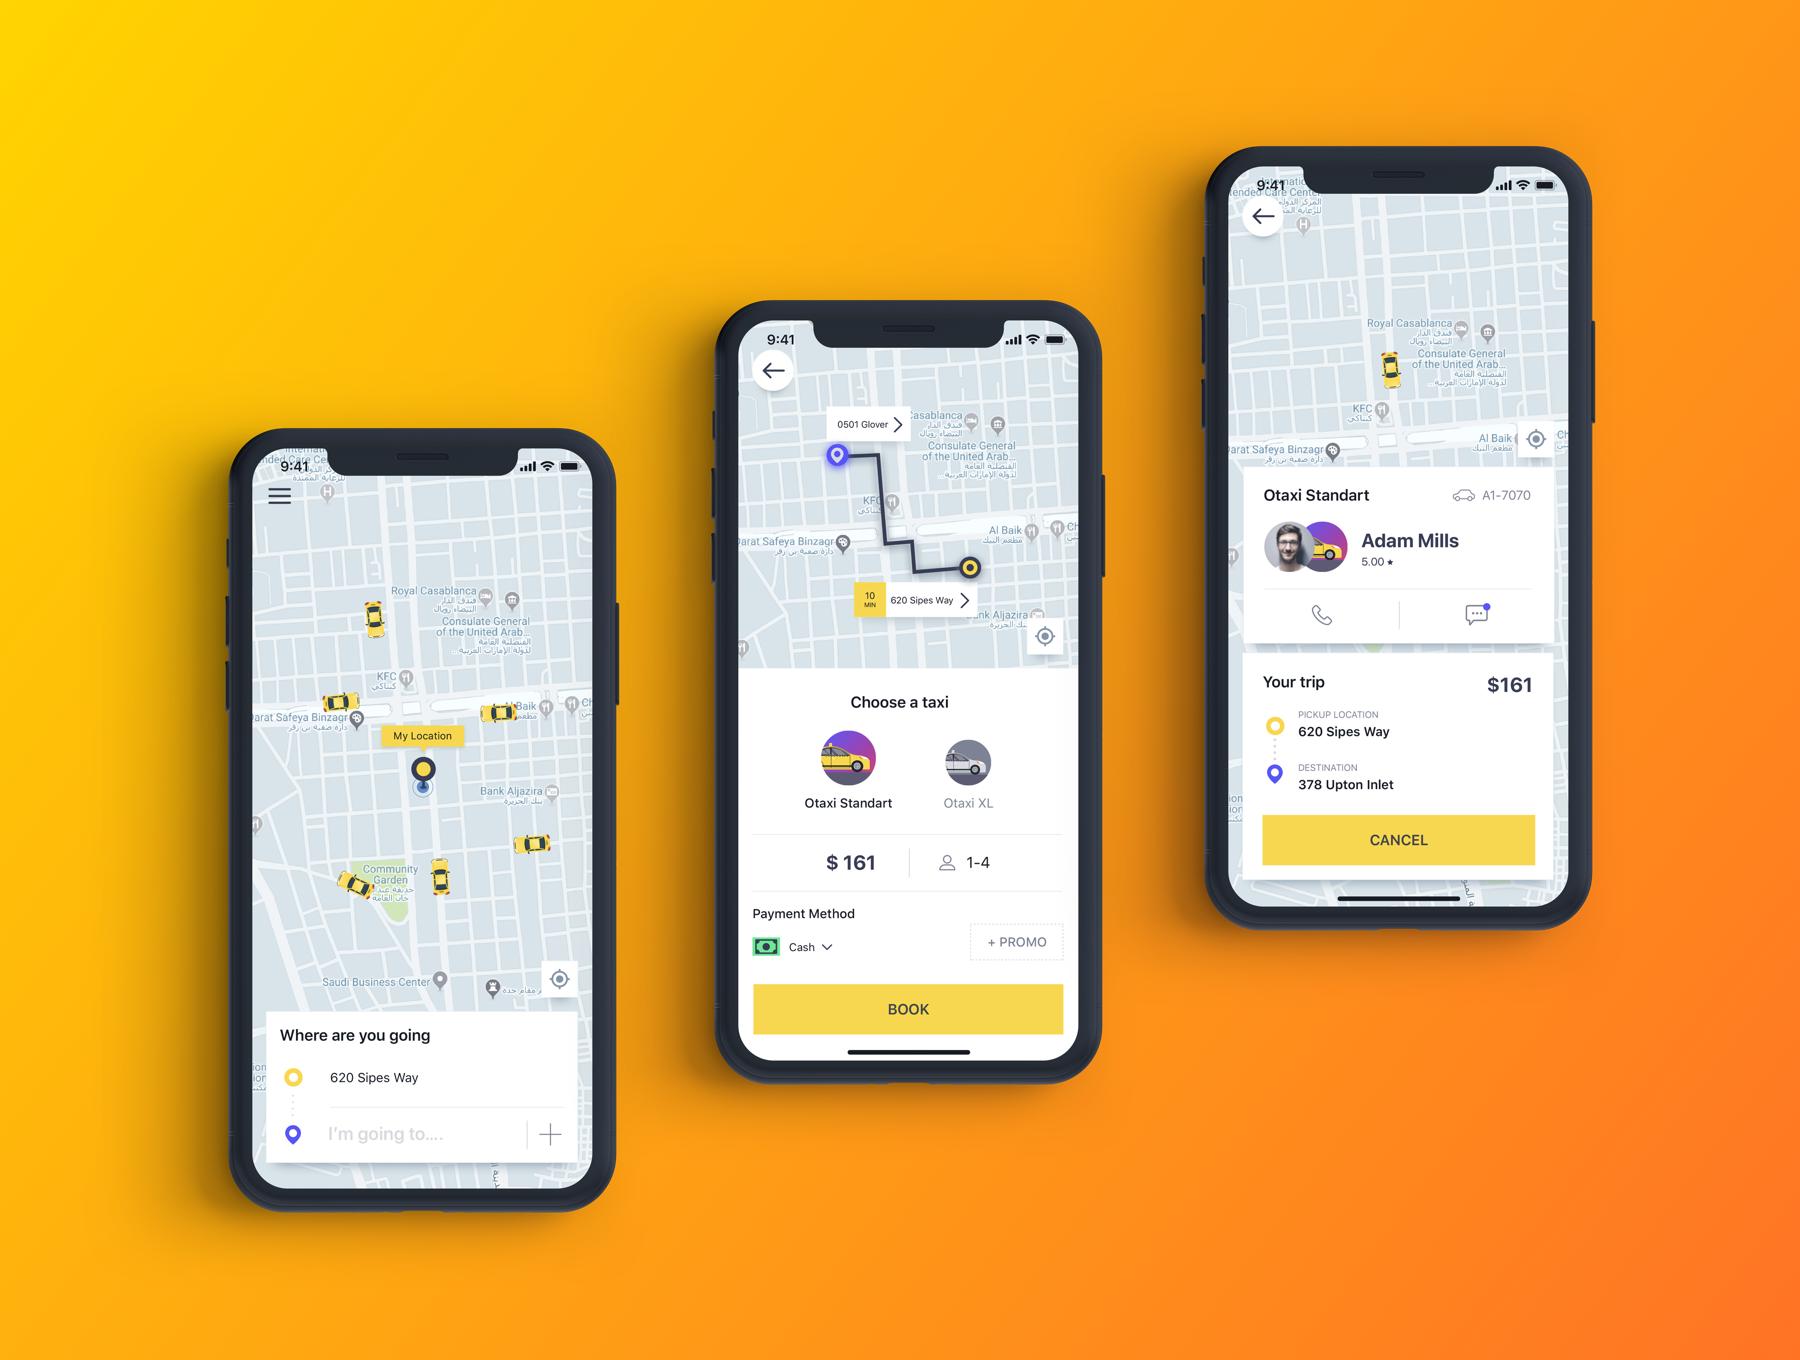 类Uber&滴滴出行叫车APP应用UI设计套件SKETCH模板 Otaxi Mobile UI Kit插图(2)